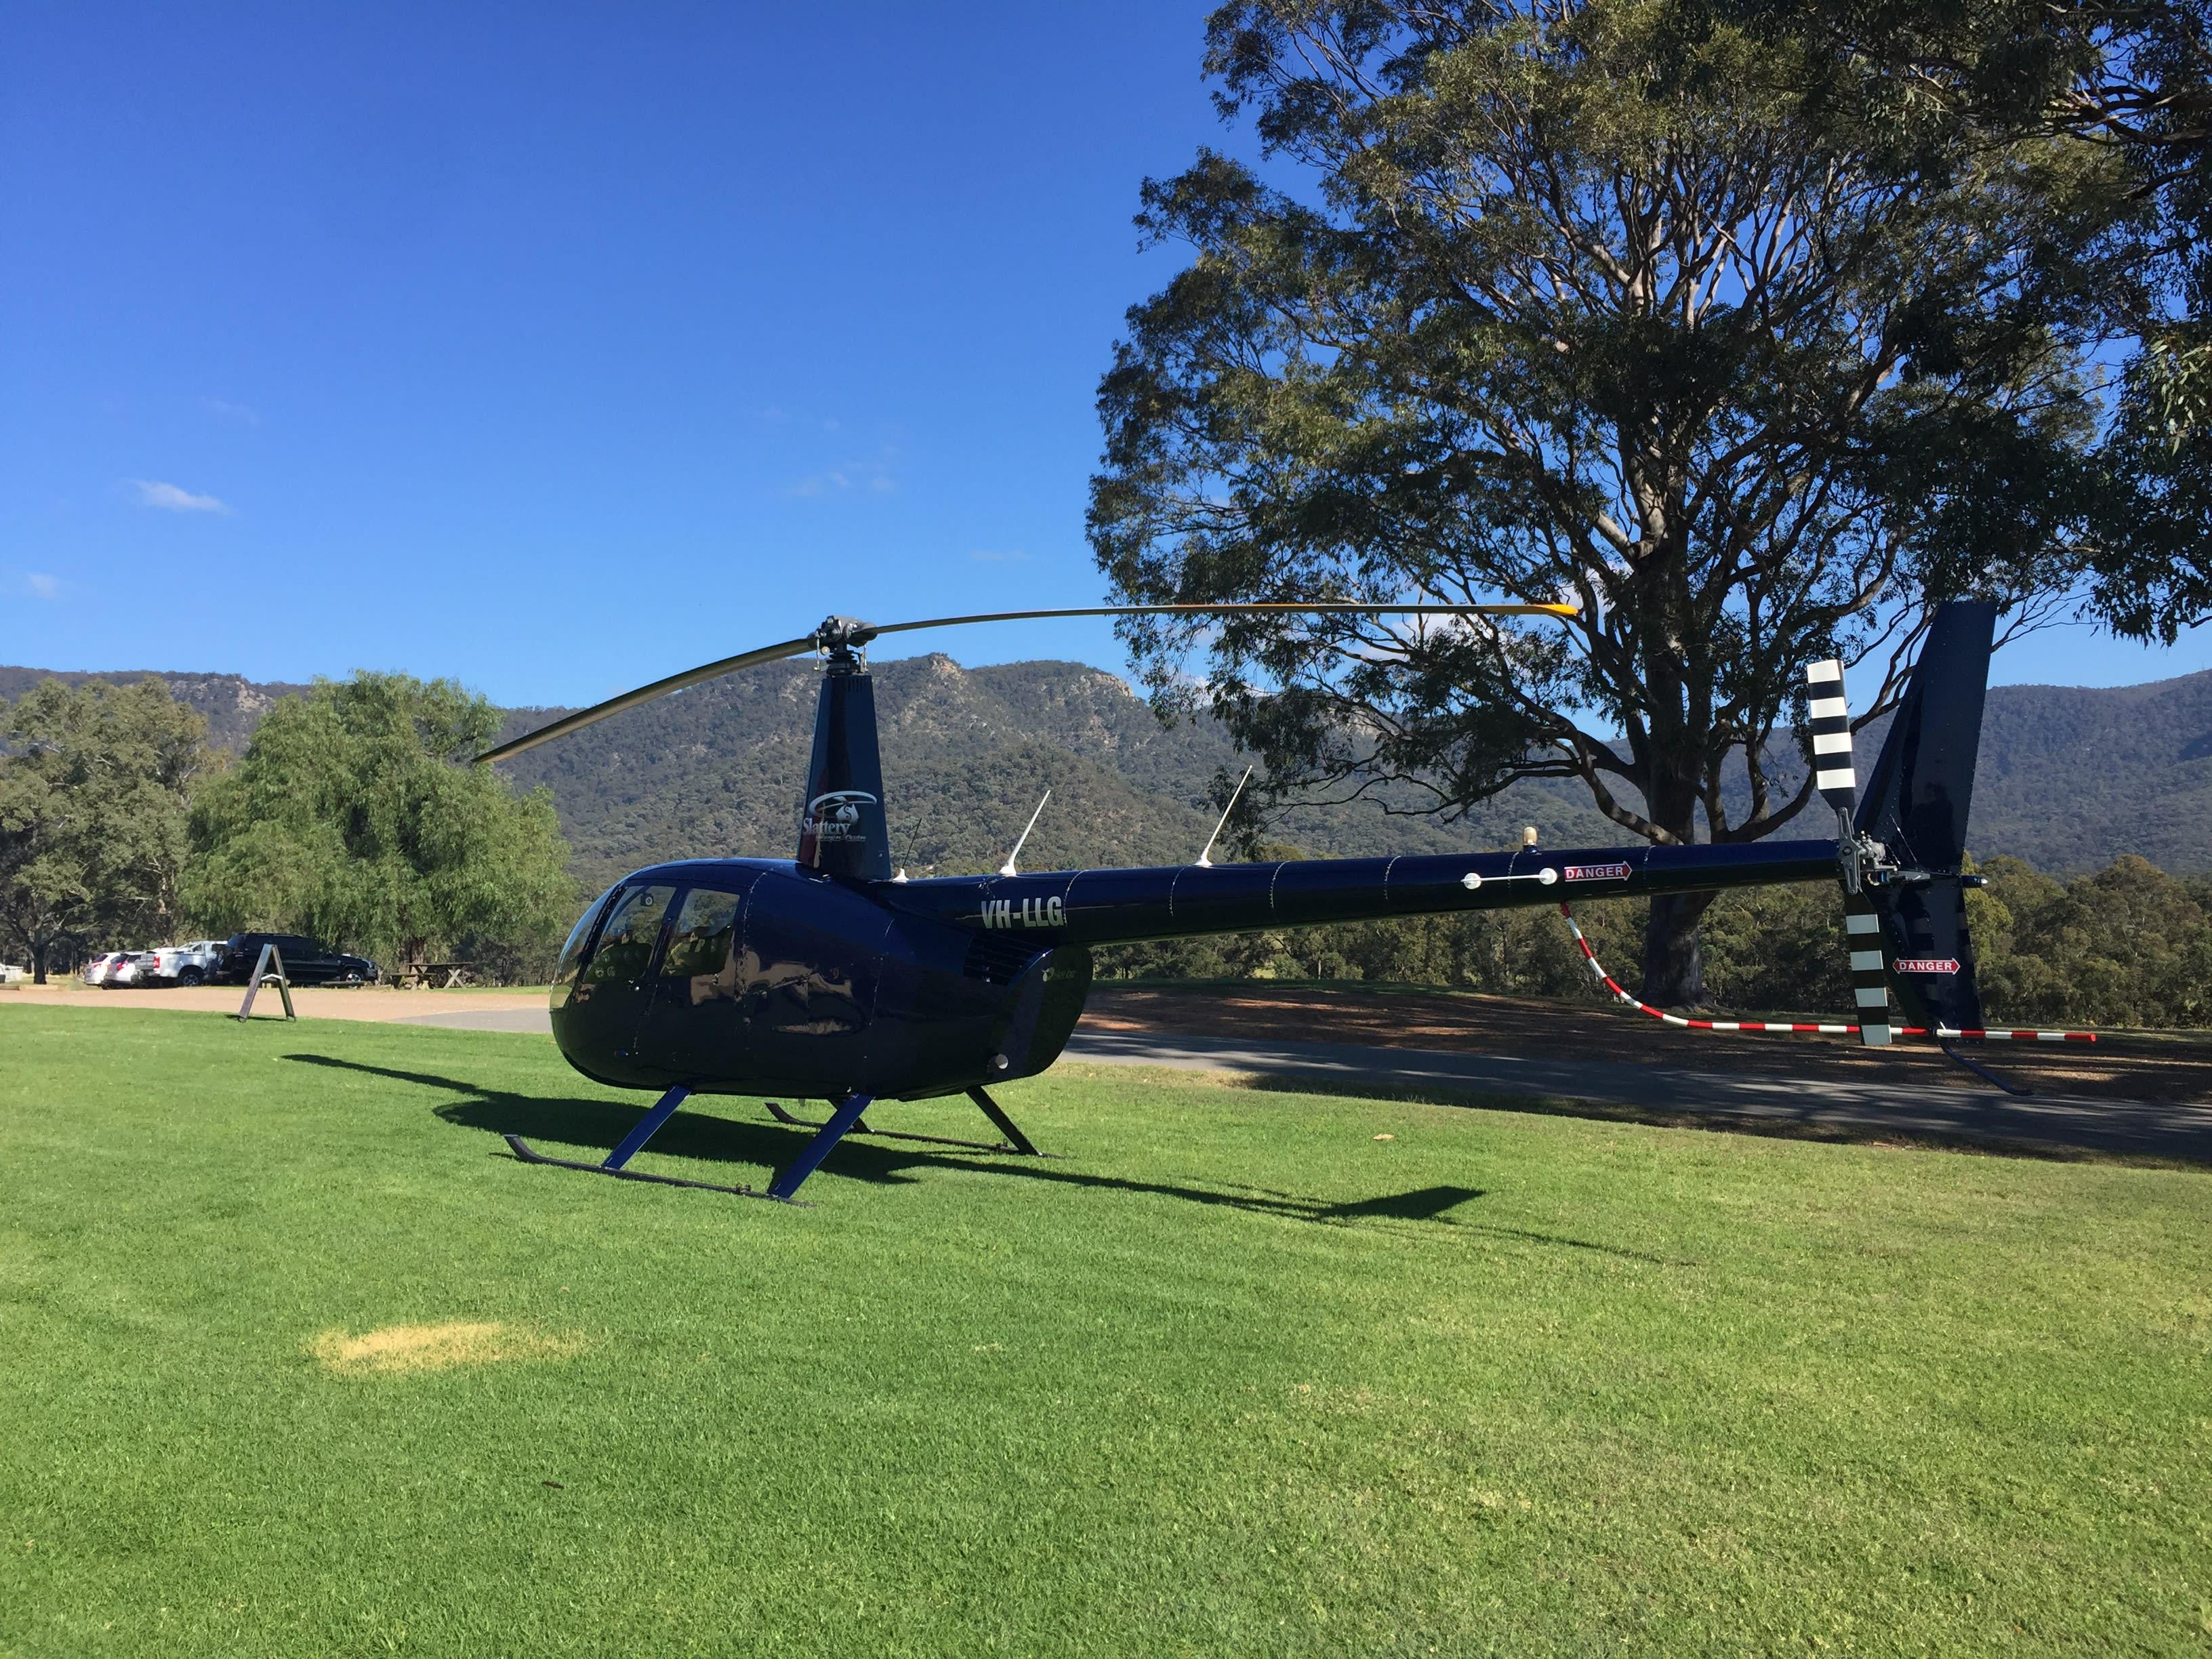 Scenic Helicopter Flight & Breakfast - Hunter Valley - For 2